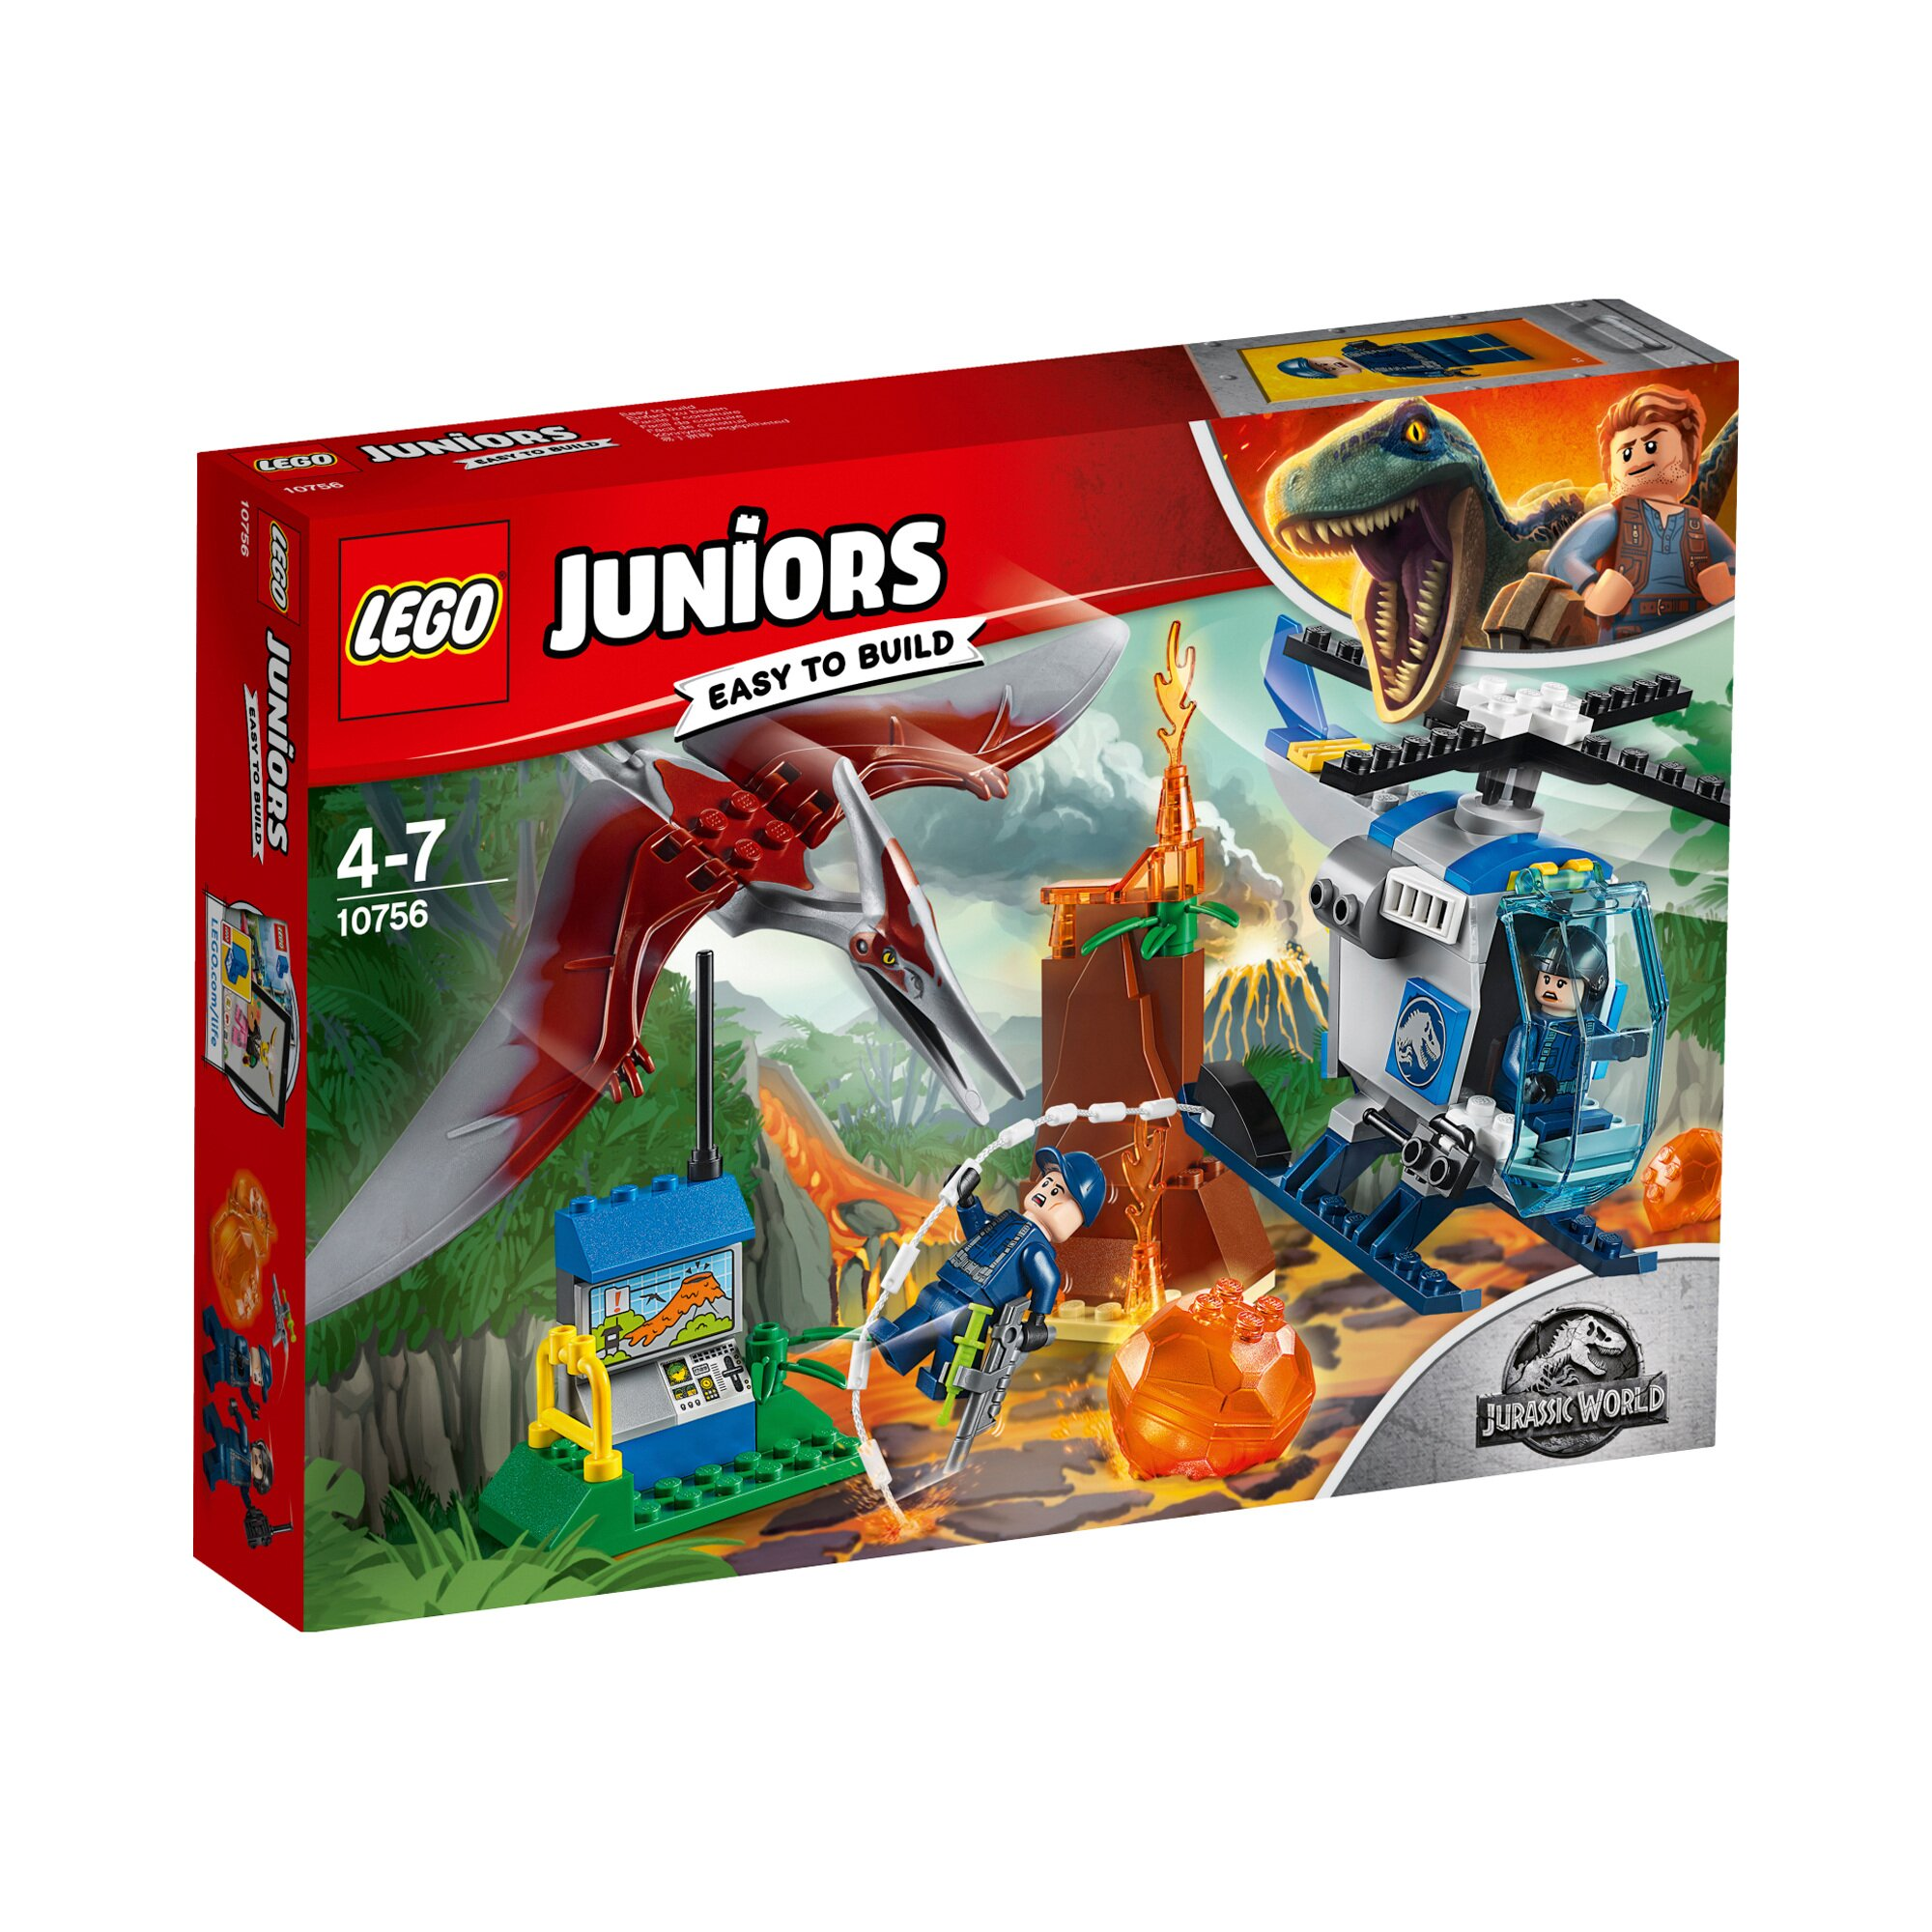 Juniors 10756 Flucht vor dem Pteranodon